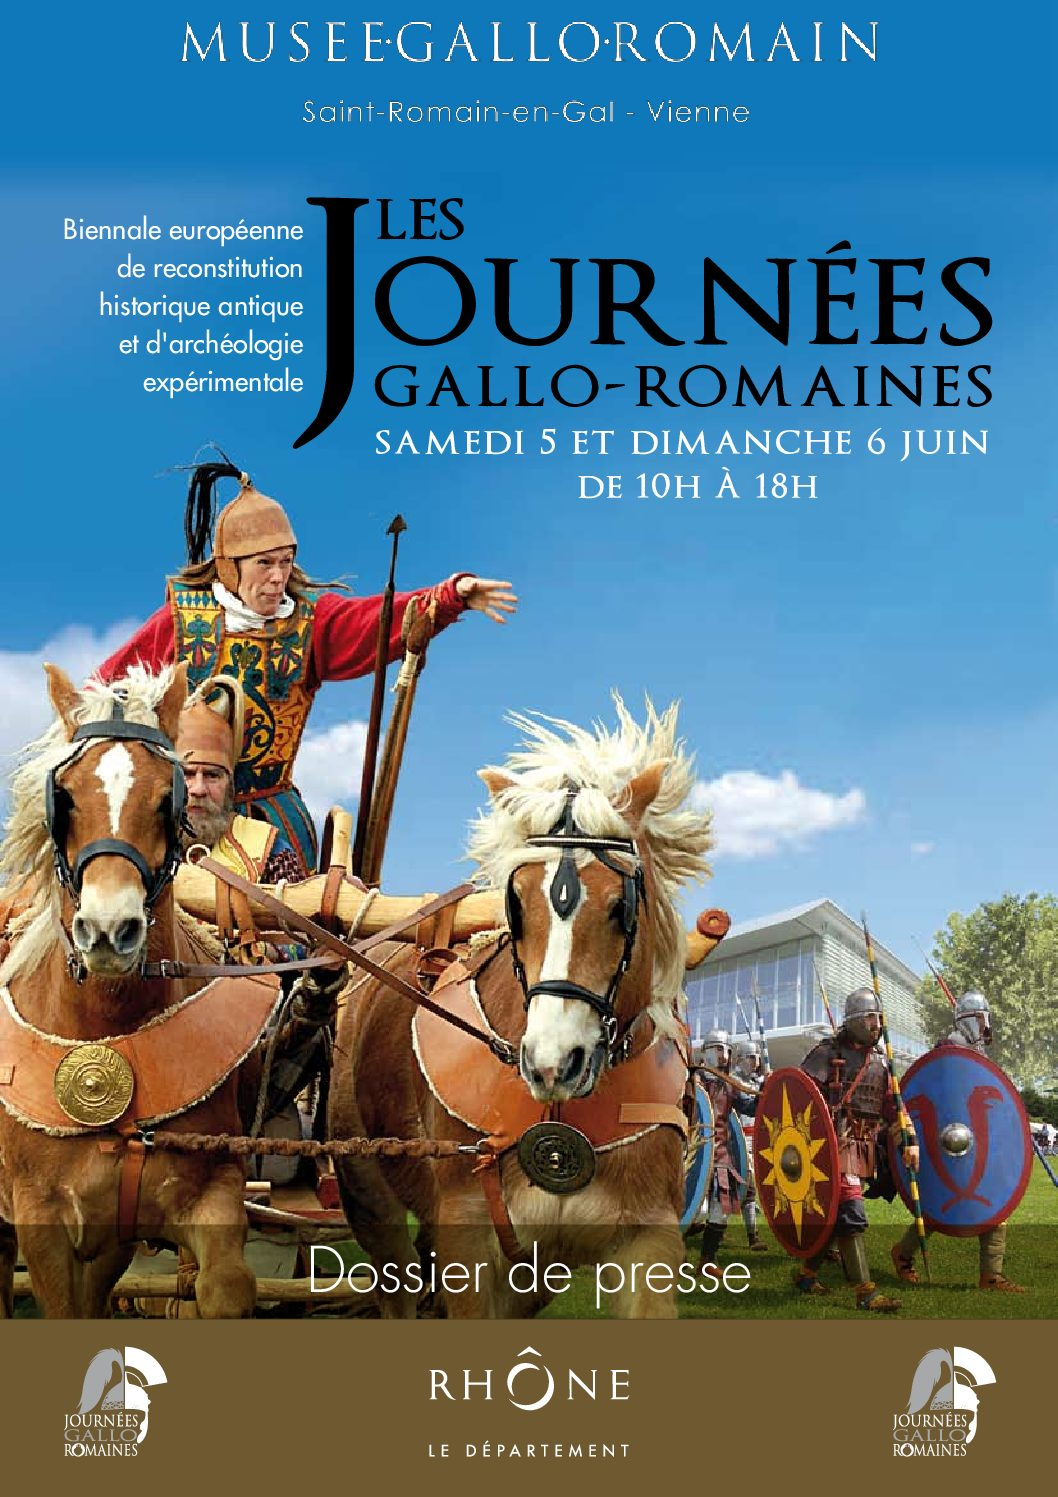 Dossier presse Journées jgallo romaines 2010 (V6)